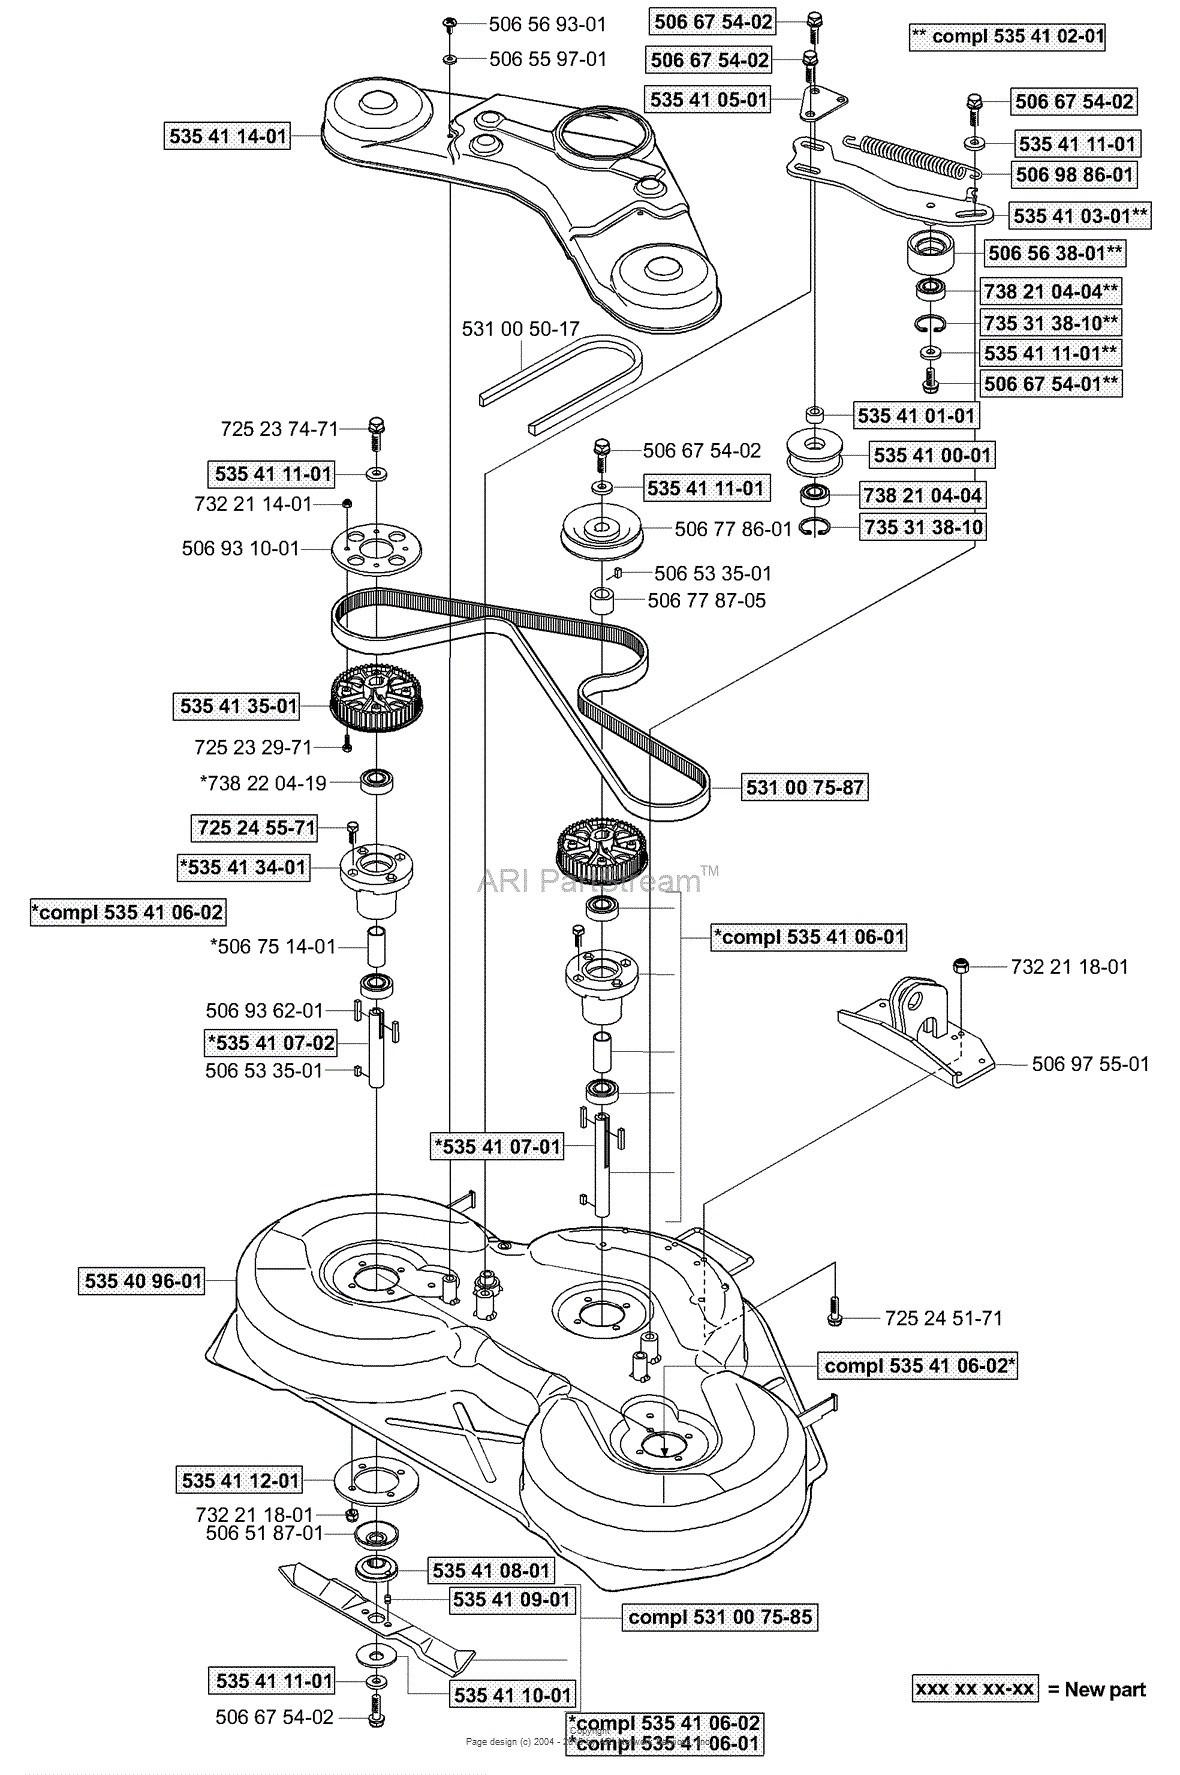 Electrolux 2100 Parts Diagram Scotts Speedy Green Spreader